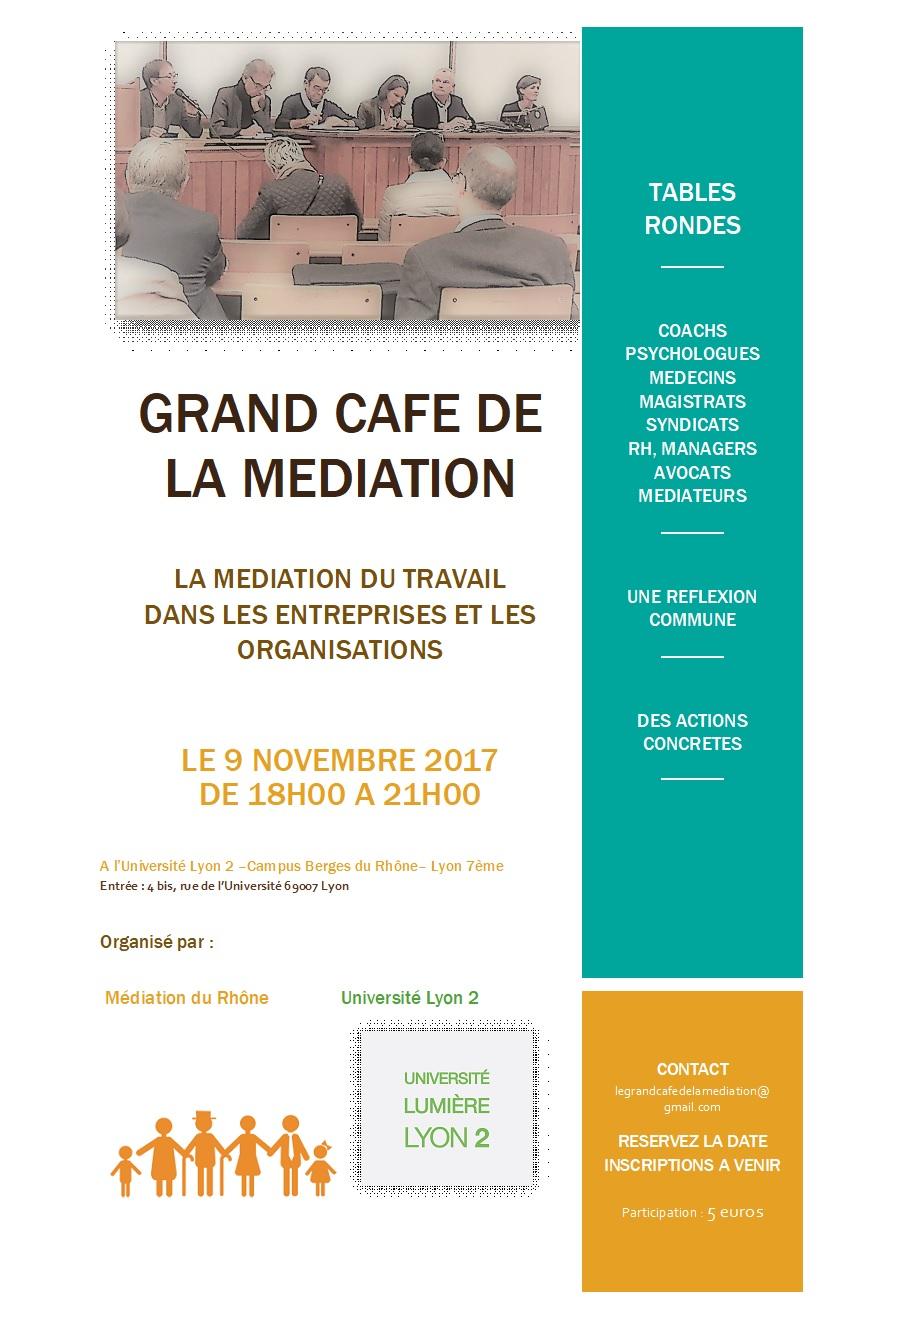 Grand Café de la Médiation 2017